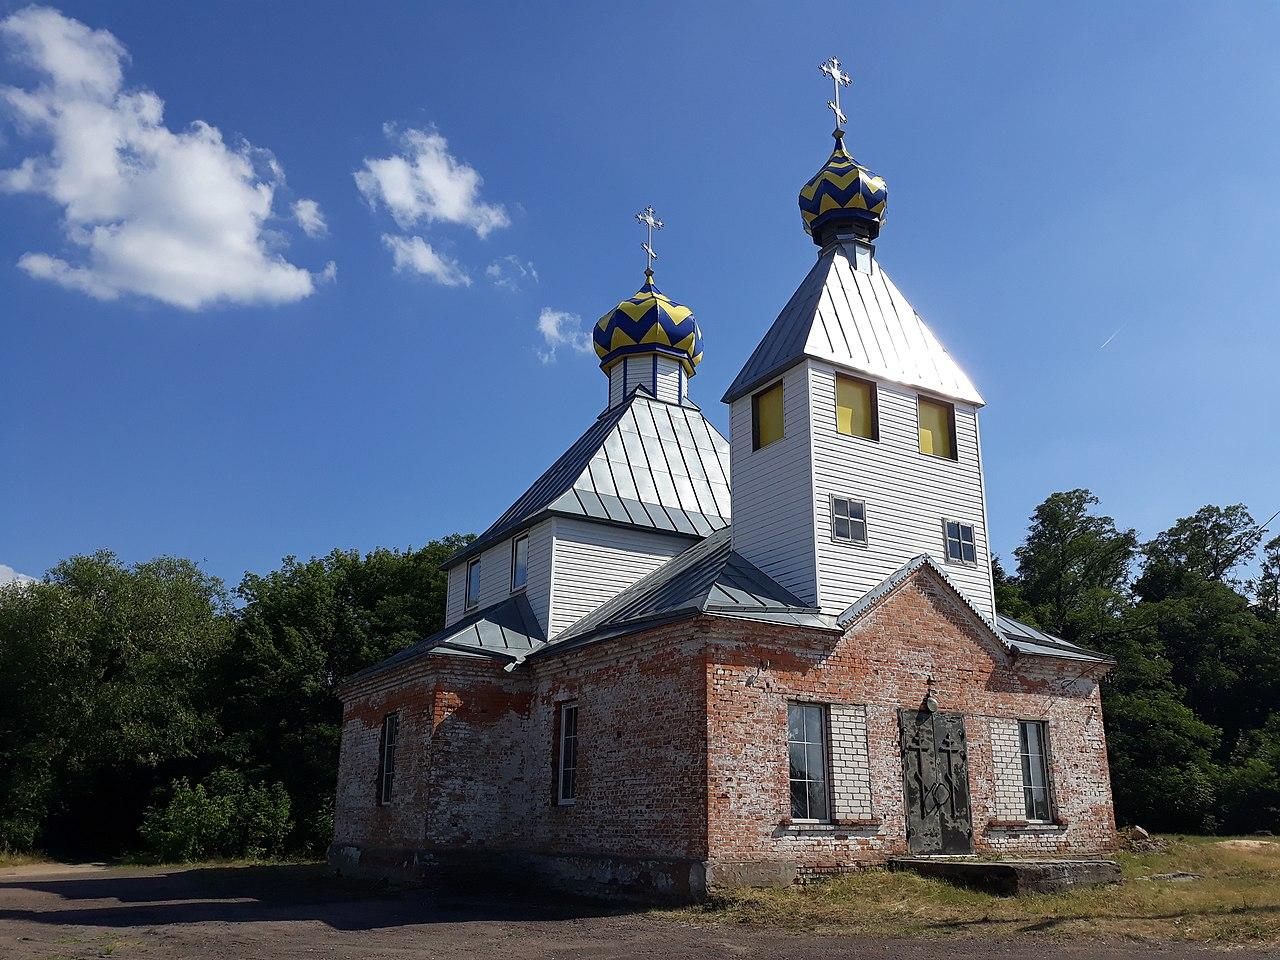 Церковь в Озаричах. https://commons.wikimedia.org/